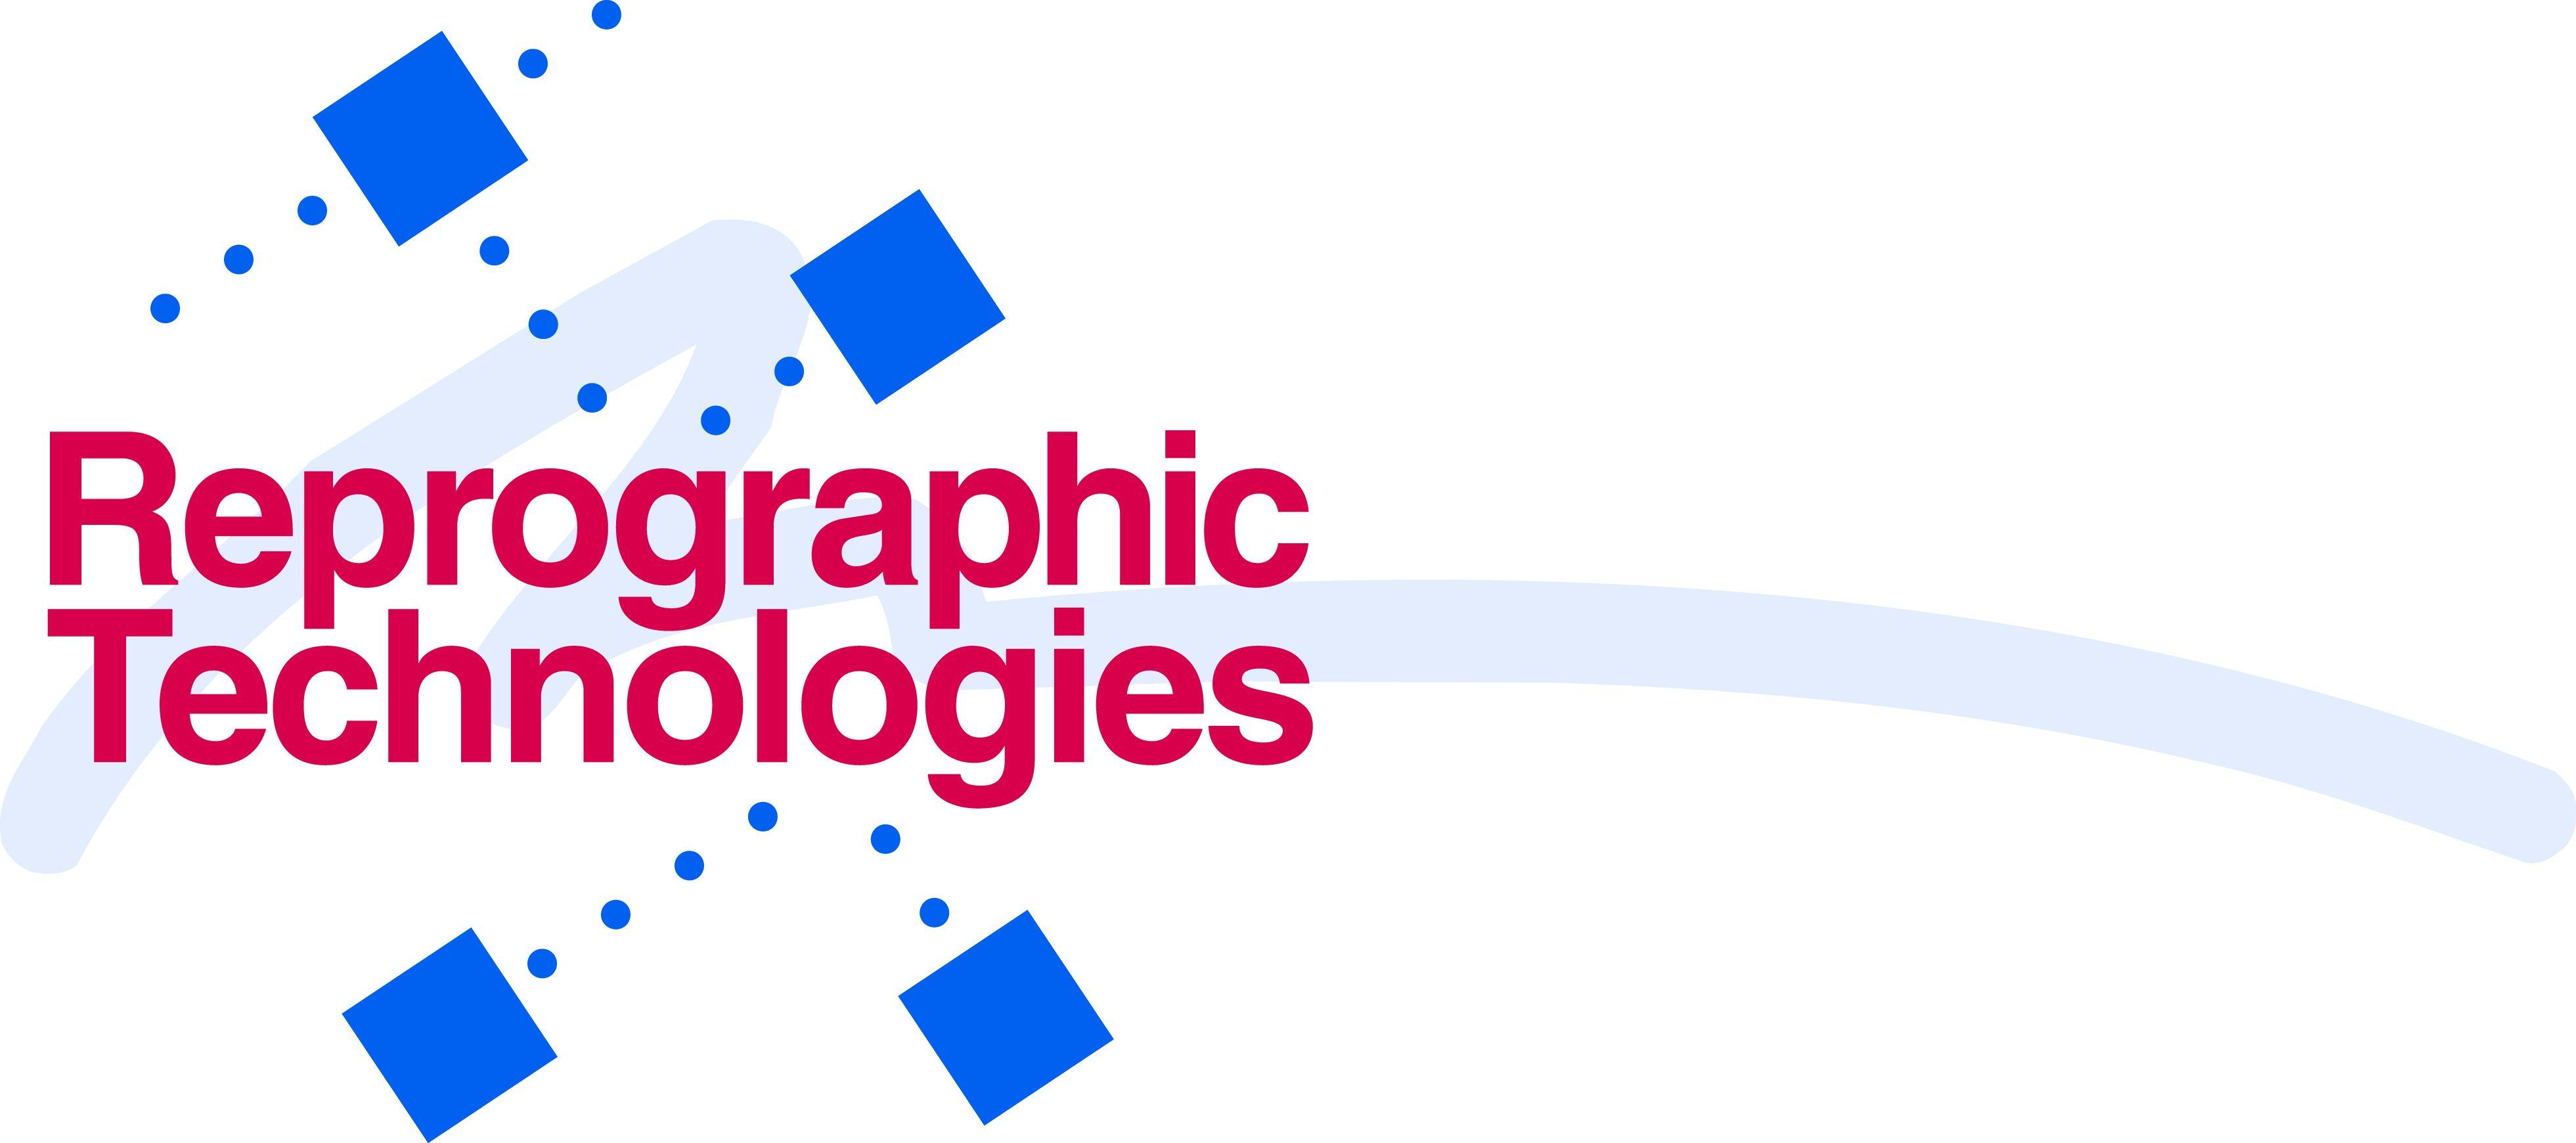 Reprographic Technologies